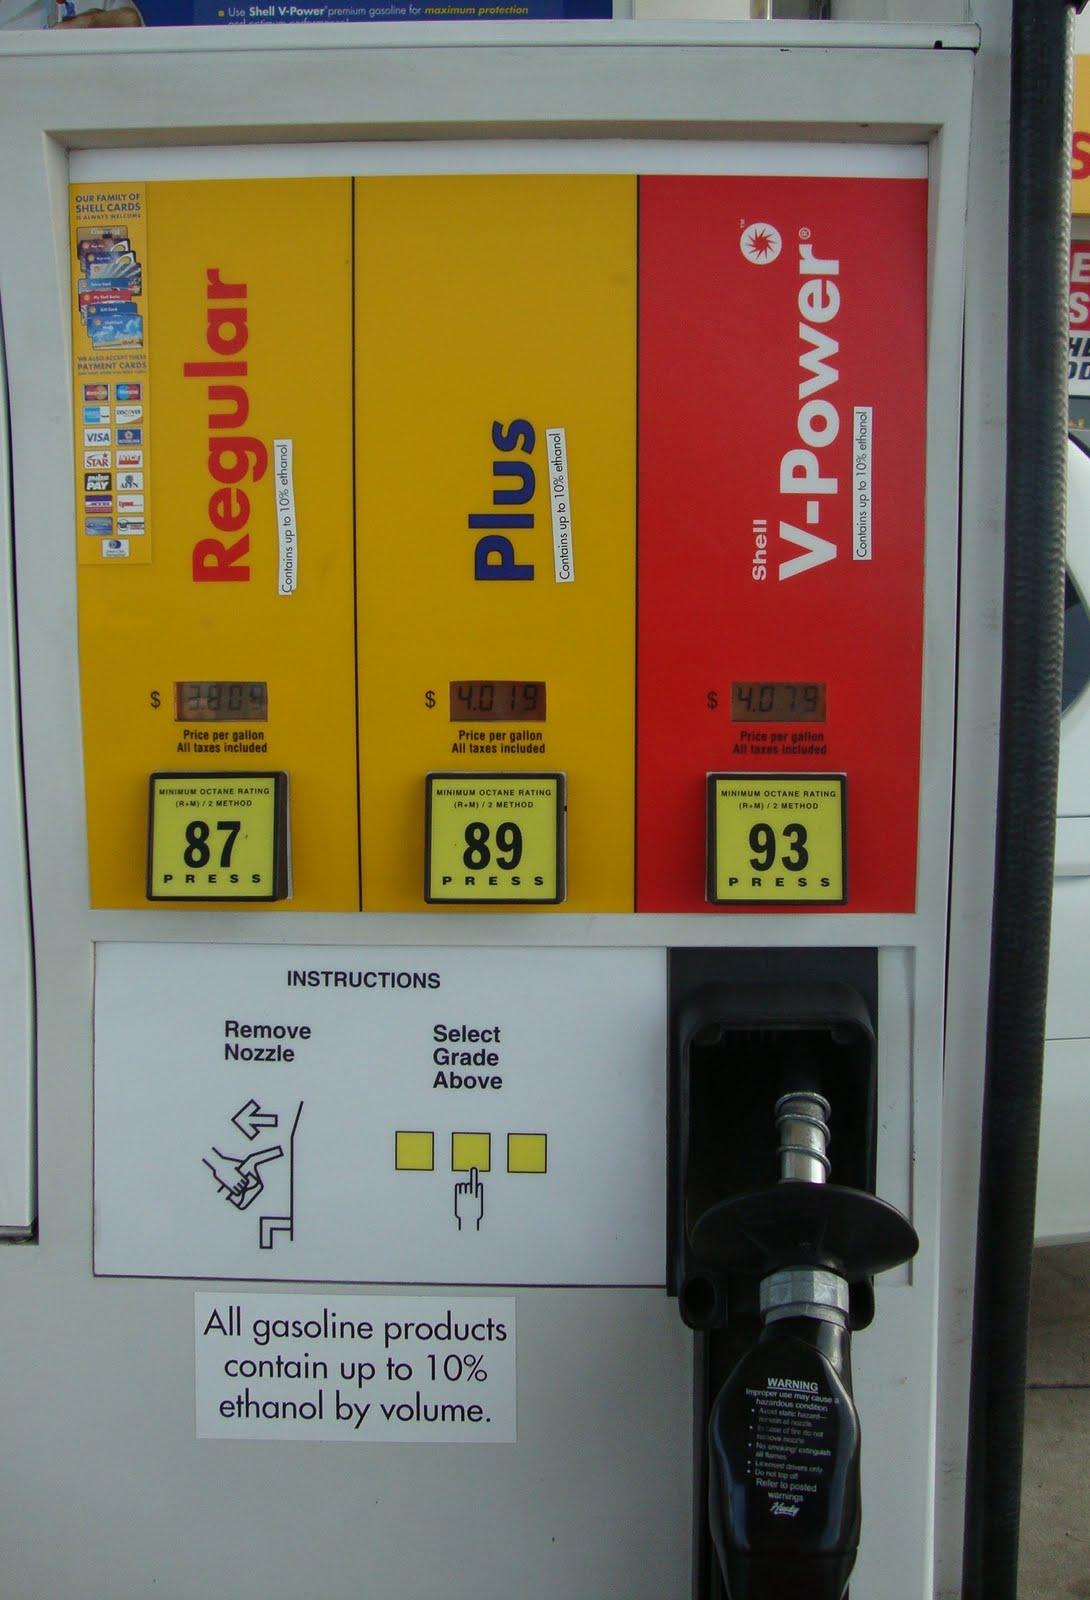 Nearest Gas Station >> Explore Florida: Shell Gas Station